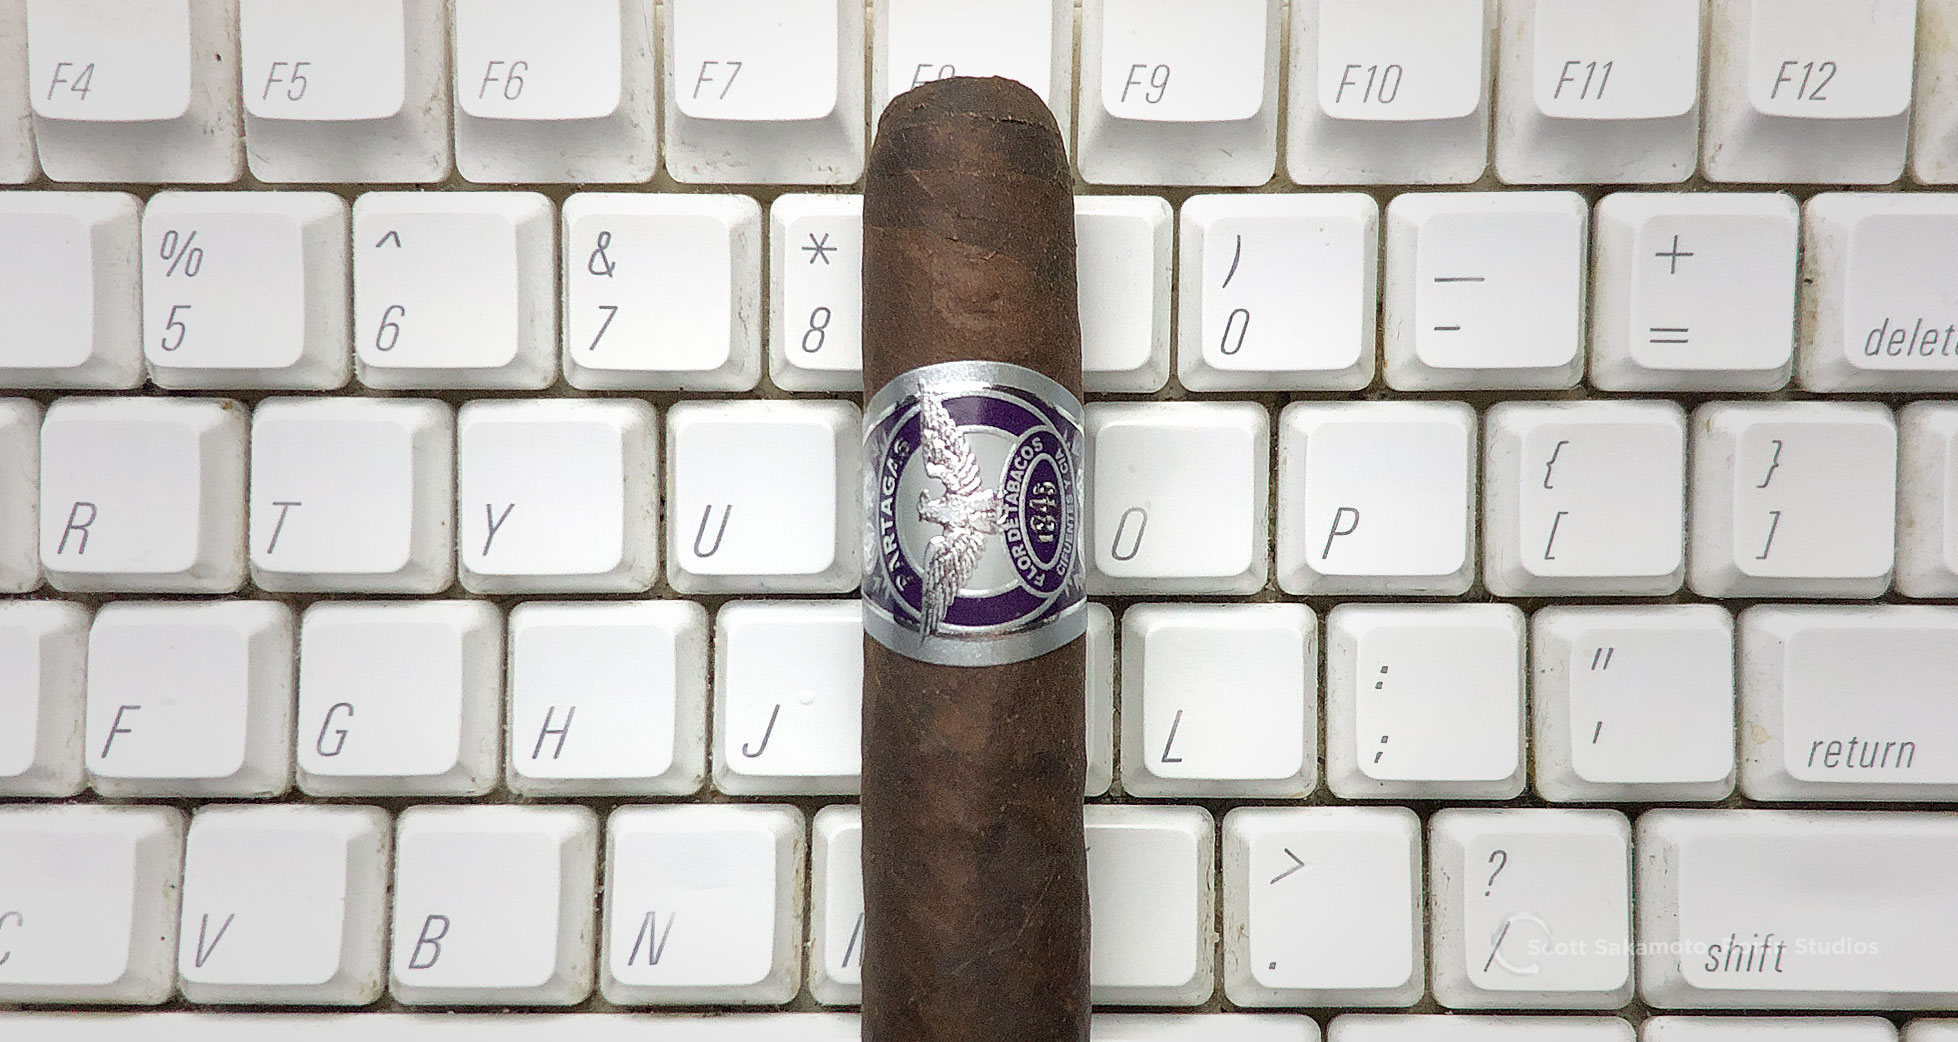 1845 Extra Oscuro, Dominican Republic, General Cigar Company, Havano Connecticut Oscuro, Honduran Ligero, Nicaraguan Ligero, Partagas Cigars, Rum Barrel Aged Dominican